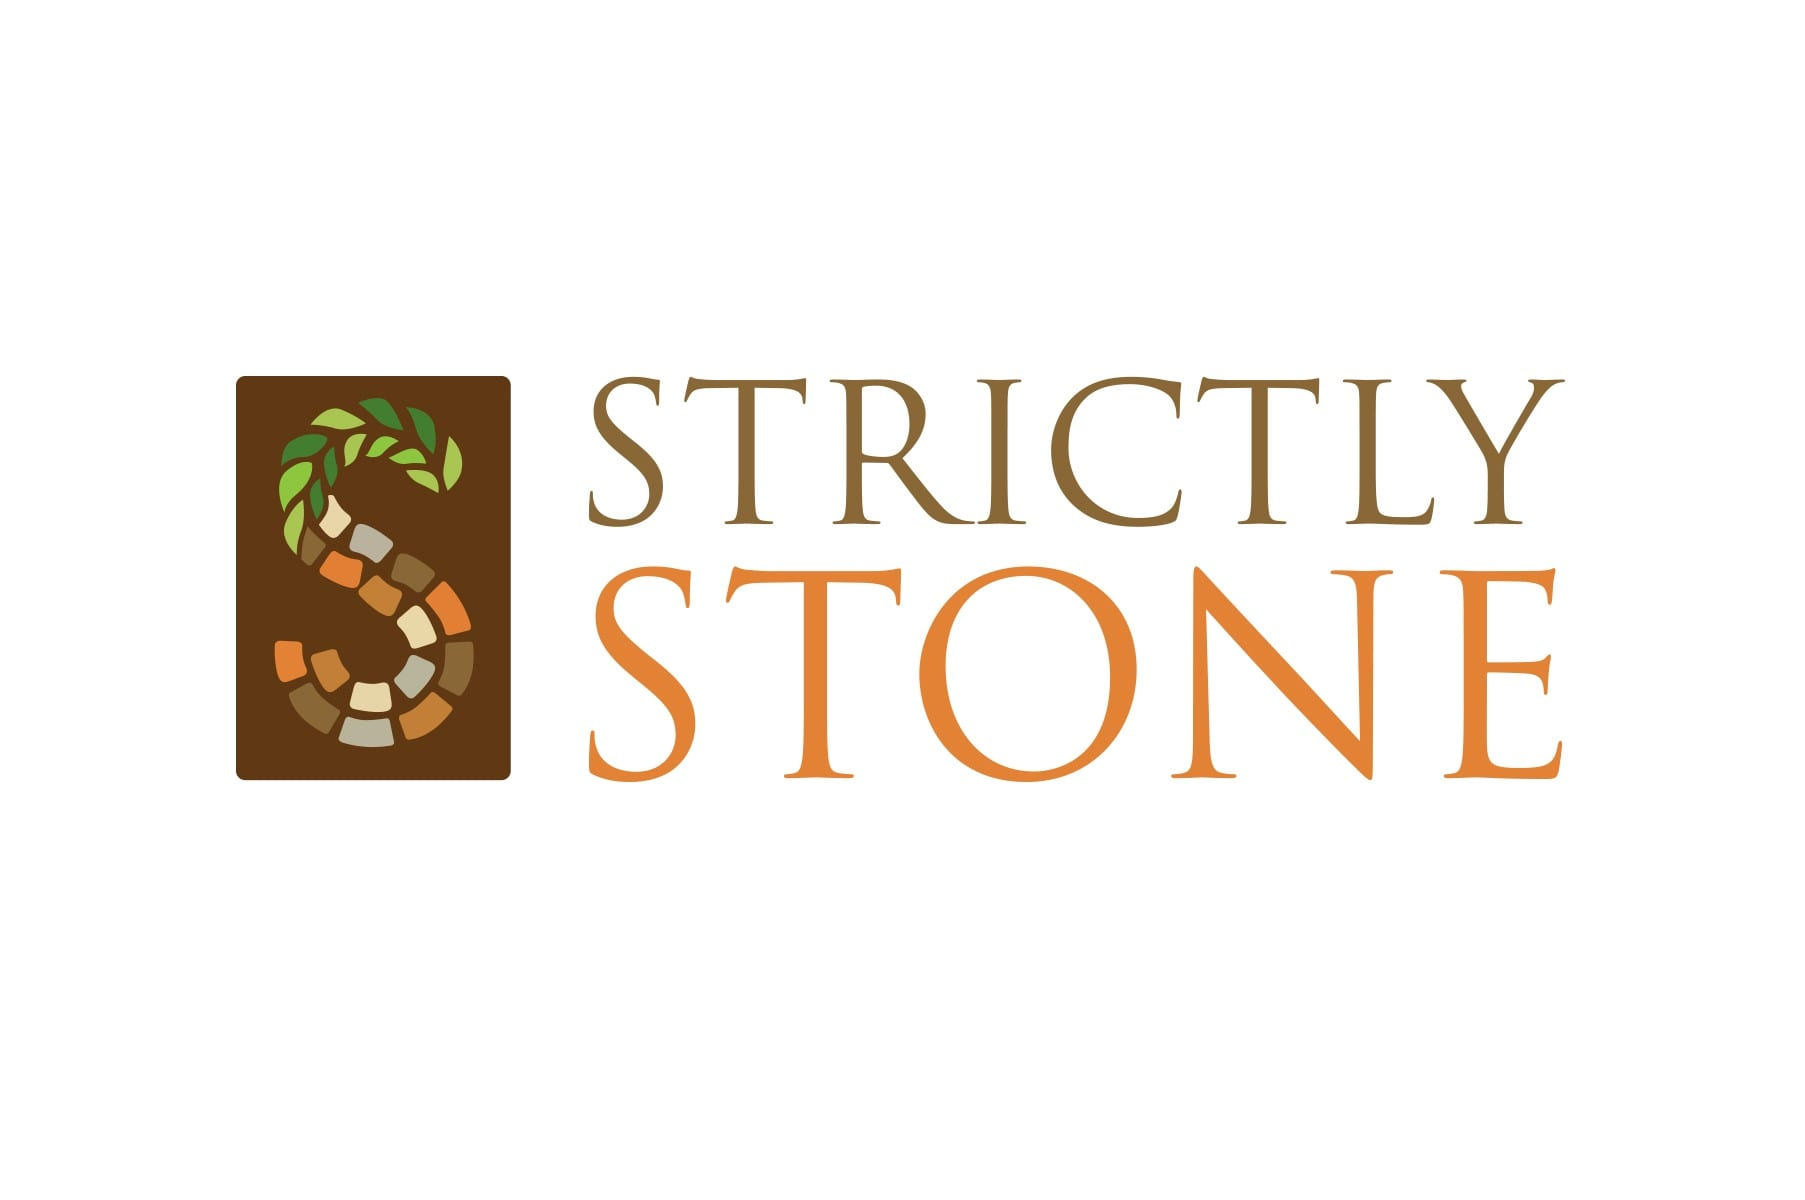 strictly-stone-logo